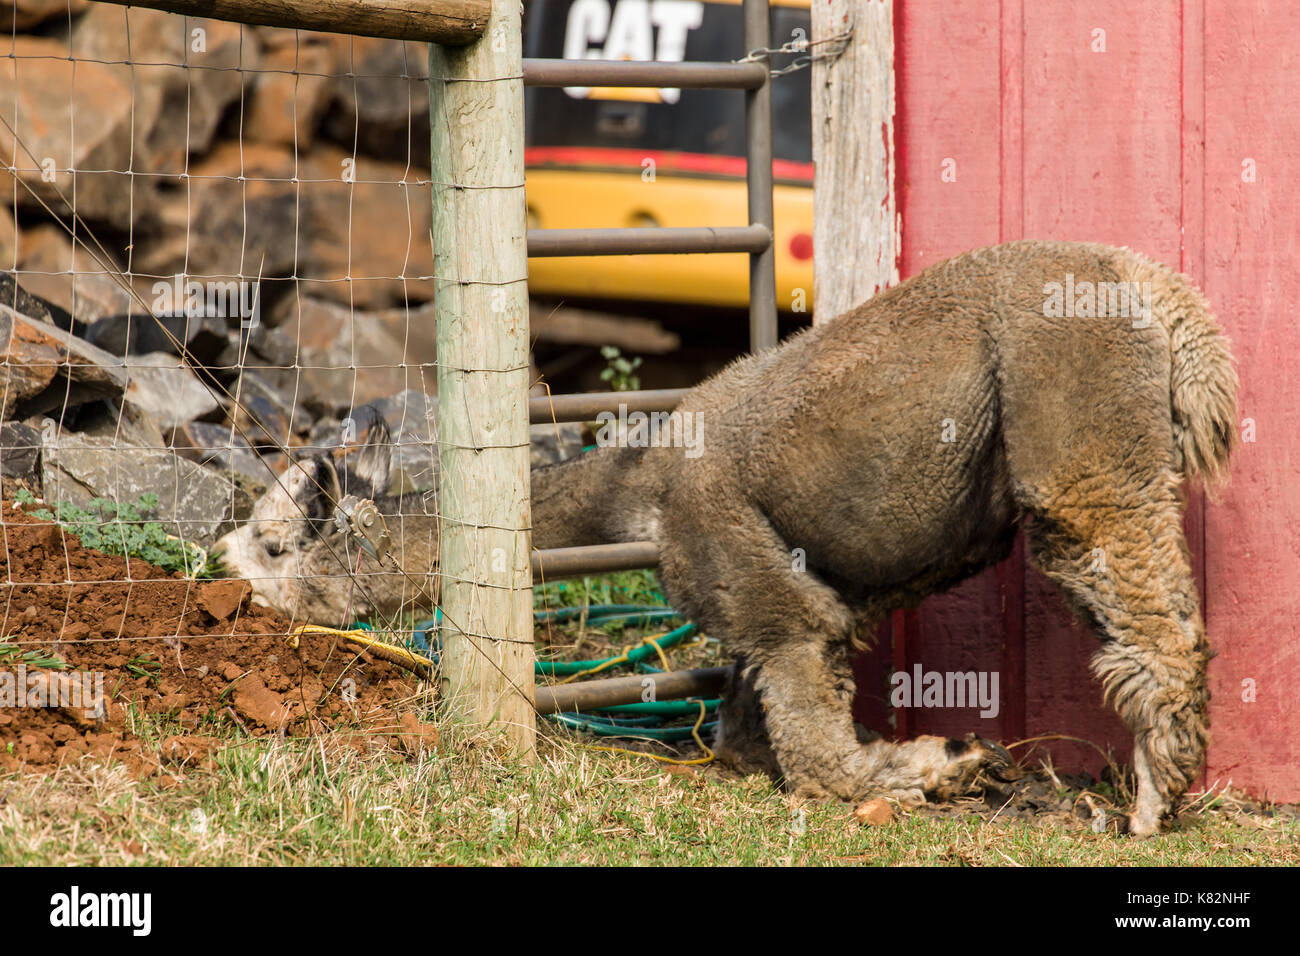 Alpaca with its head through the fence, at the Cascade Alpacas and Foothills Yarn & Fiber farm near Hood River, Stock Photo